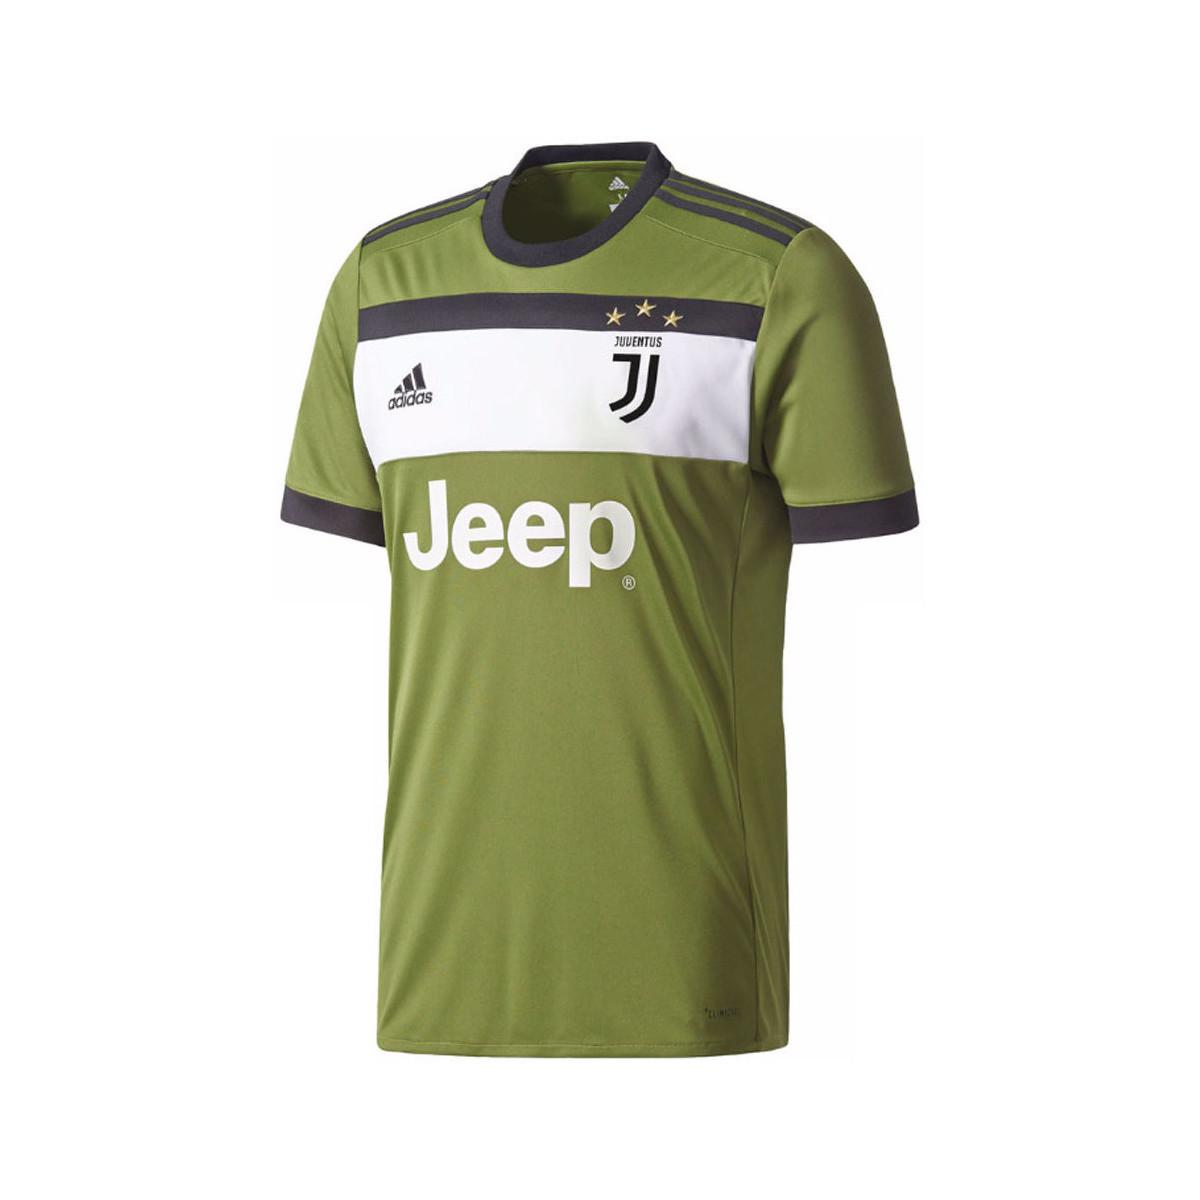 e2a69bcc8 Adidas 2017-18 Juventus Third Shirt (pjanic 5) - Kids Women s T ...